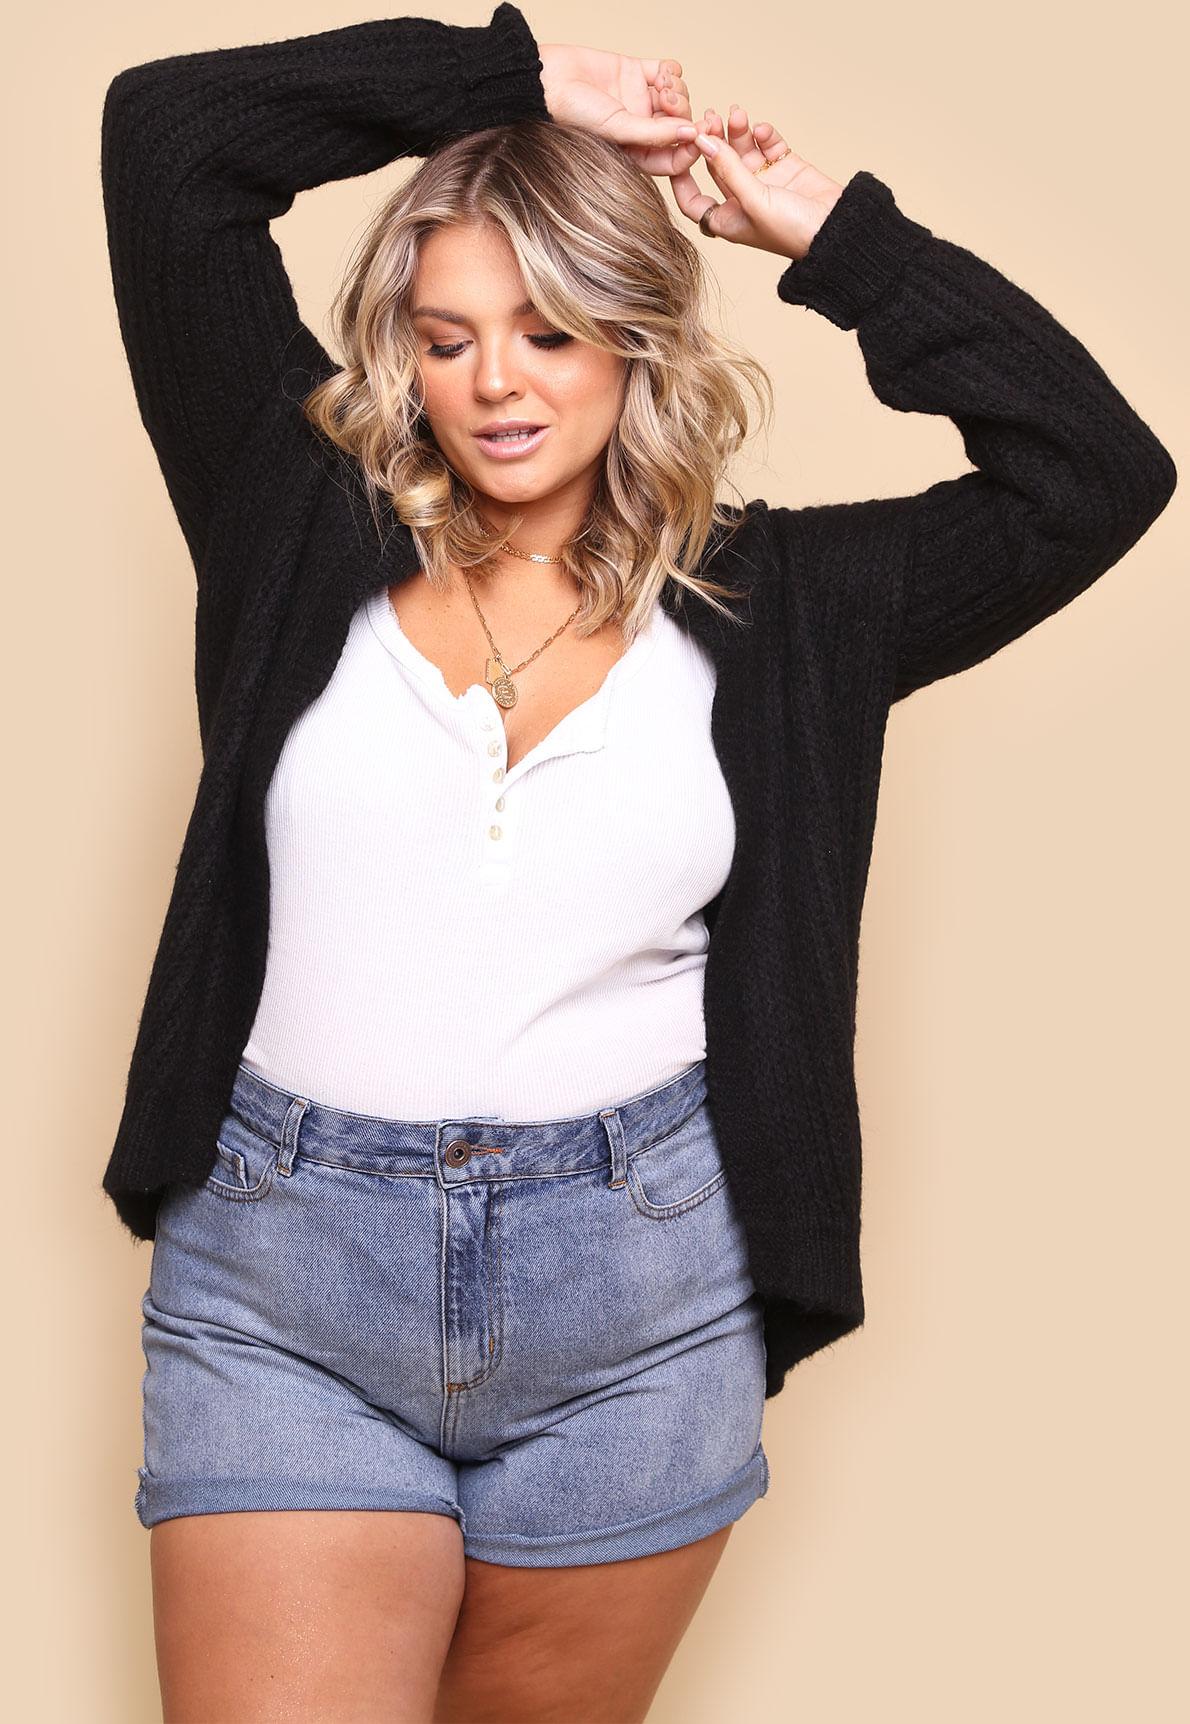 21927-shorts-mom-jeans-new-mama-mundo-lolita-05